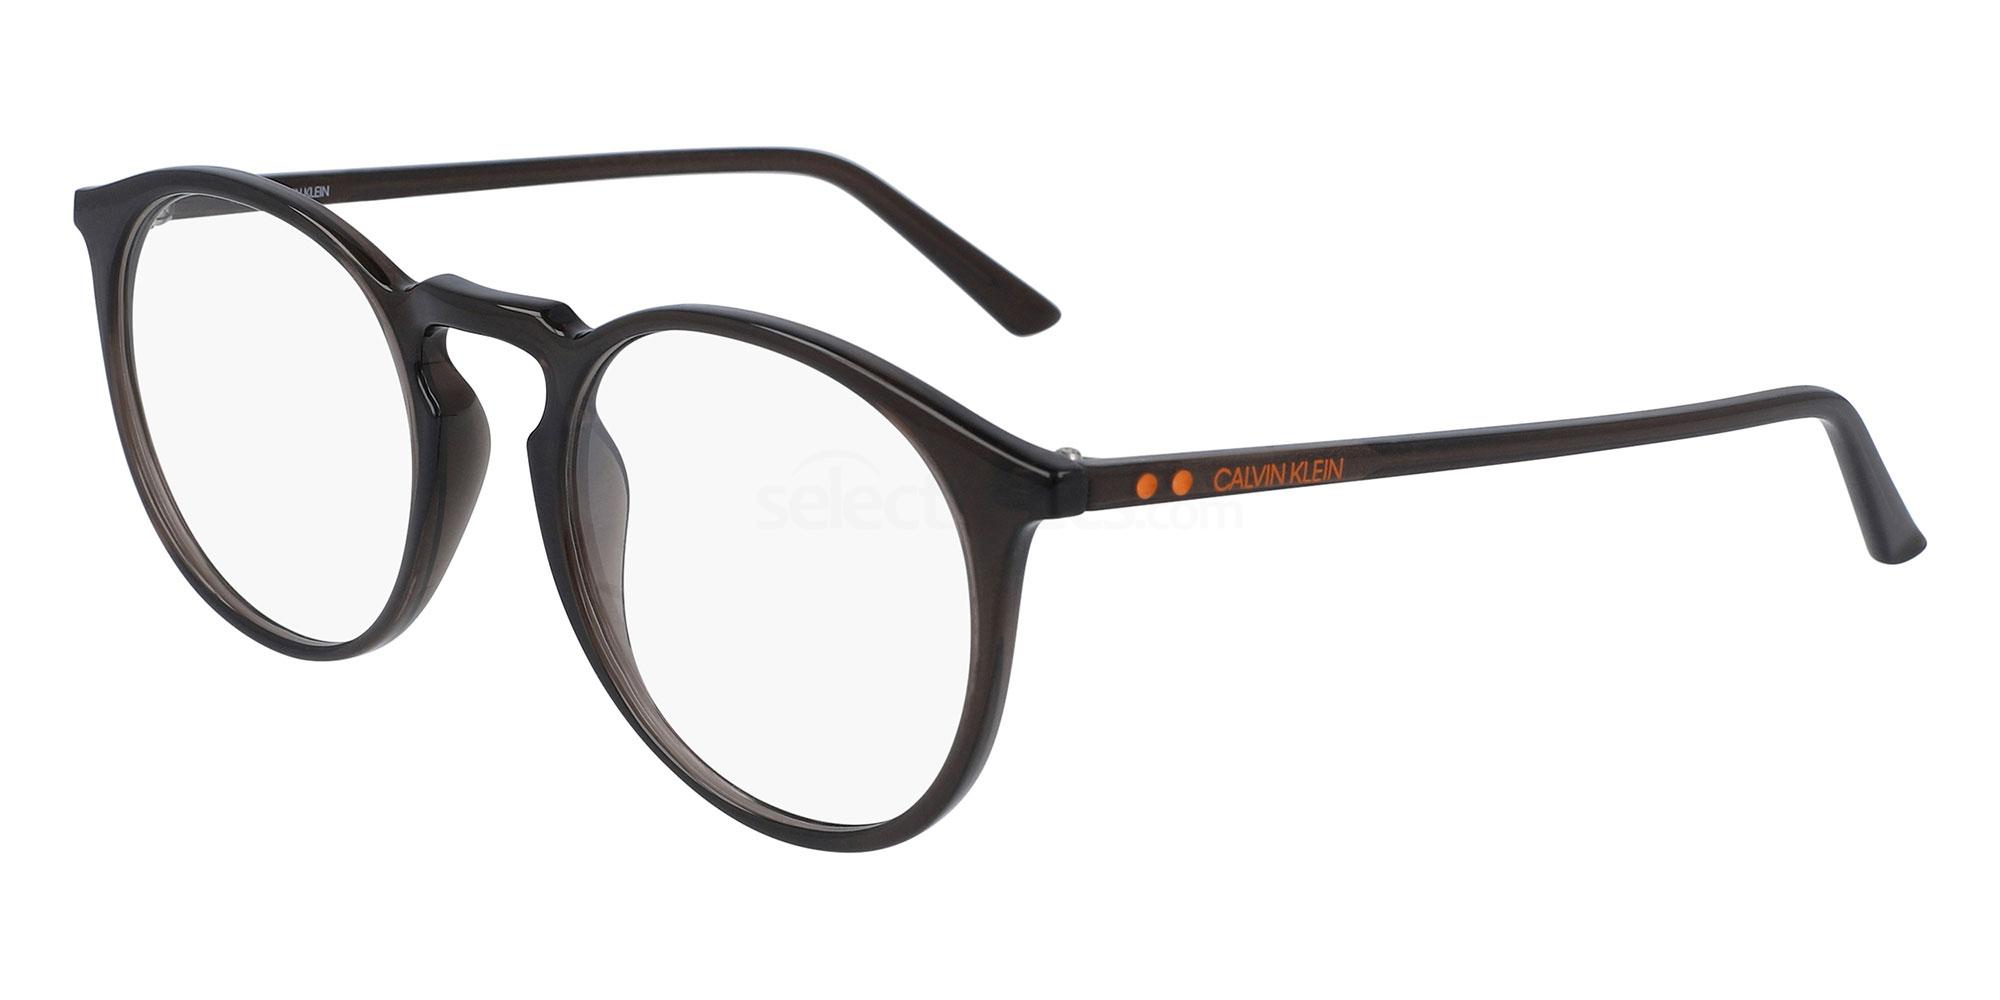 201 CK19517 Glasses, Calvin Klein